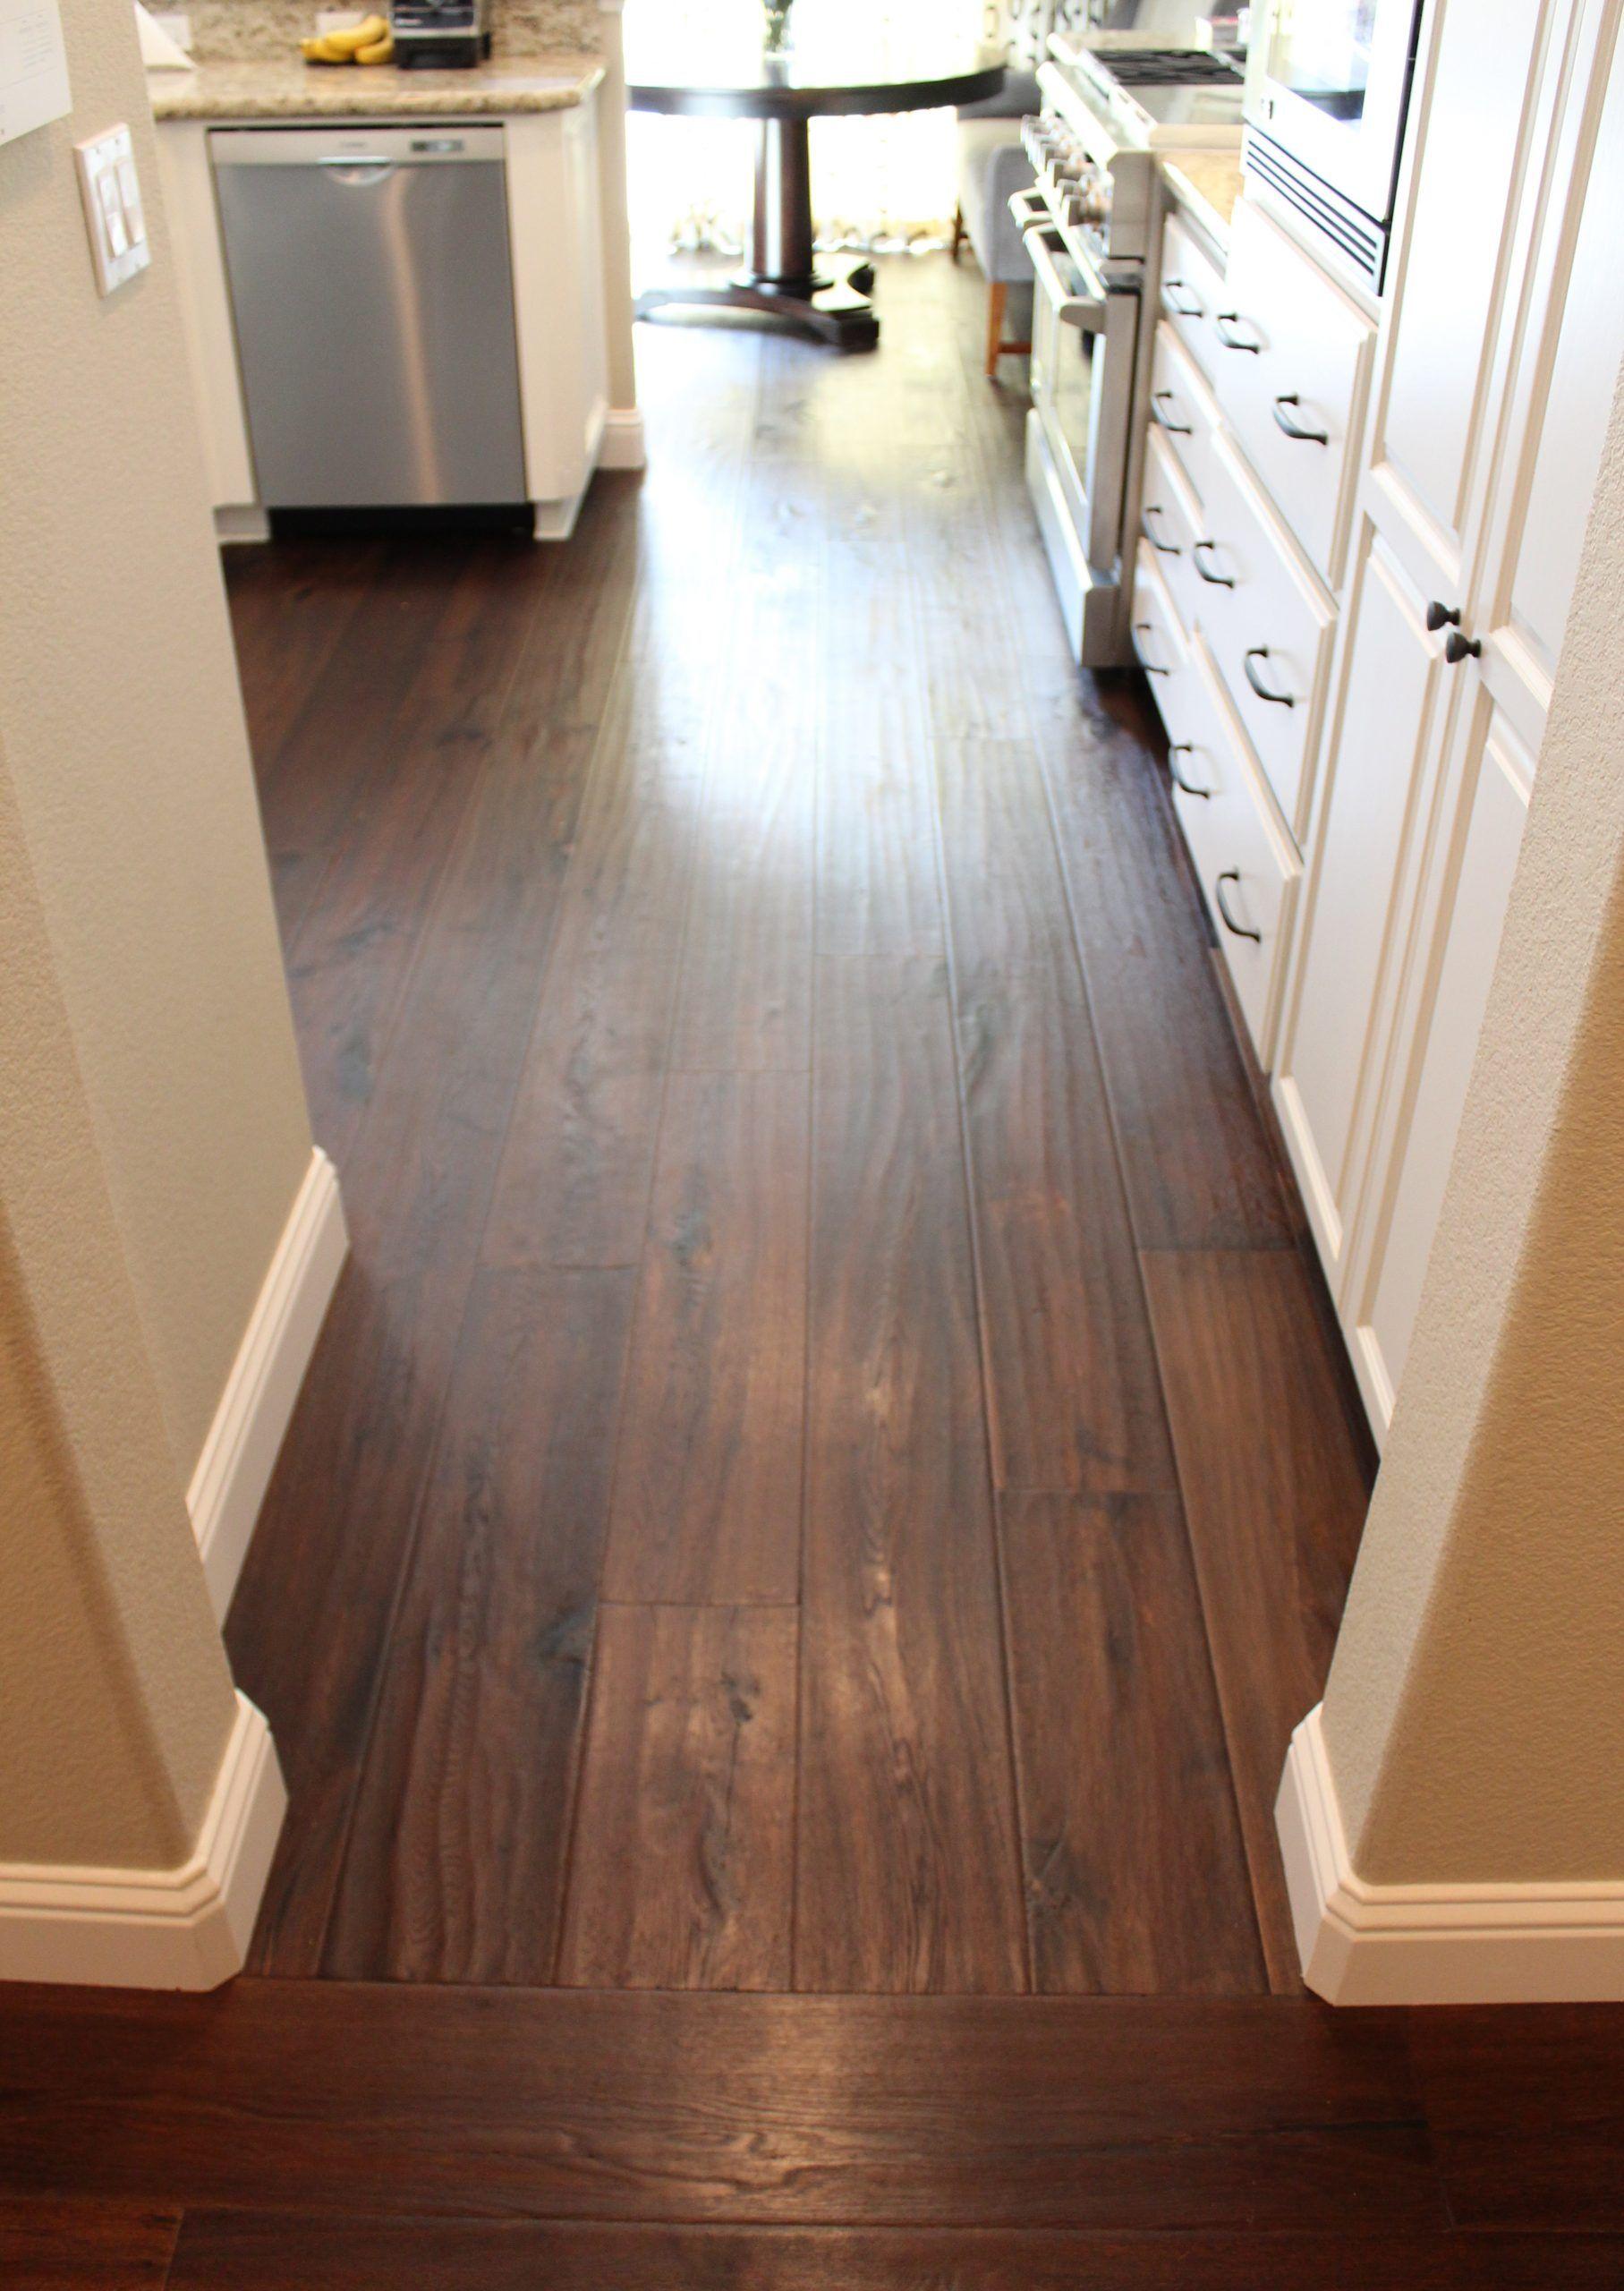 Laminate Flooring Direction Change In 2020 Laying Laminate Flooring Laying Hardwood Floors Flooring